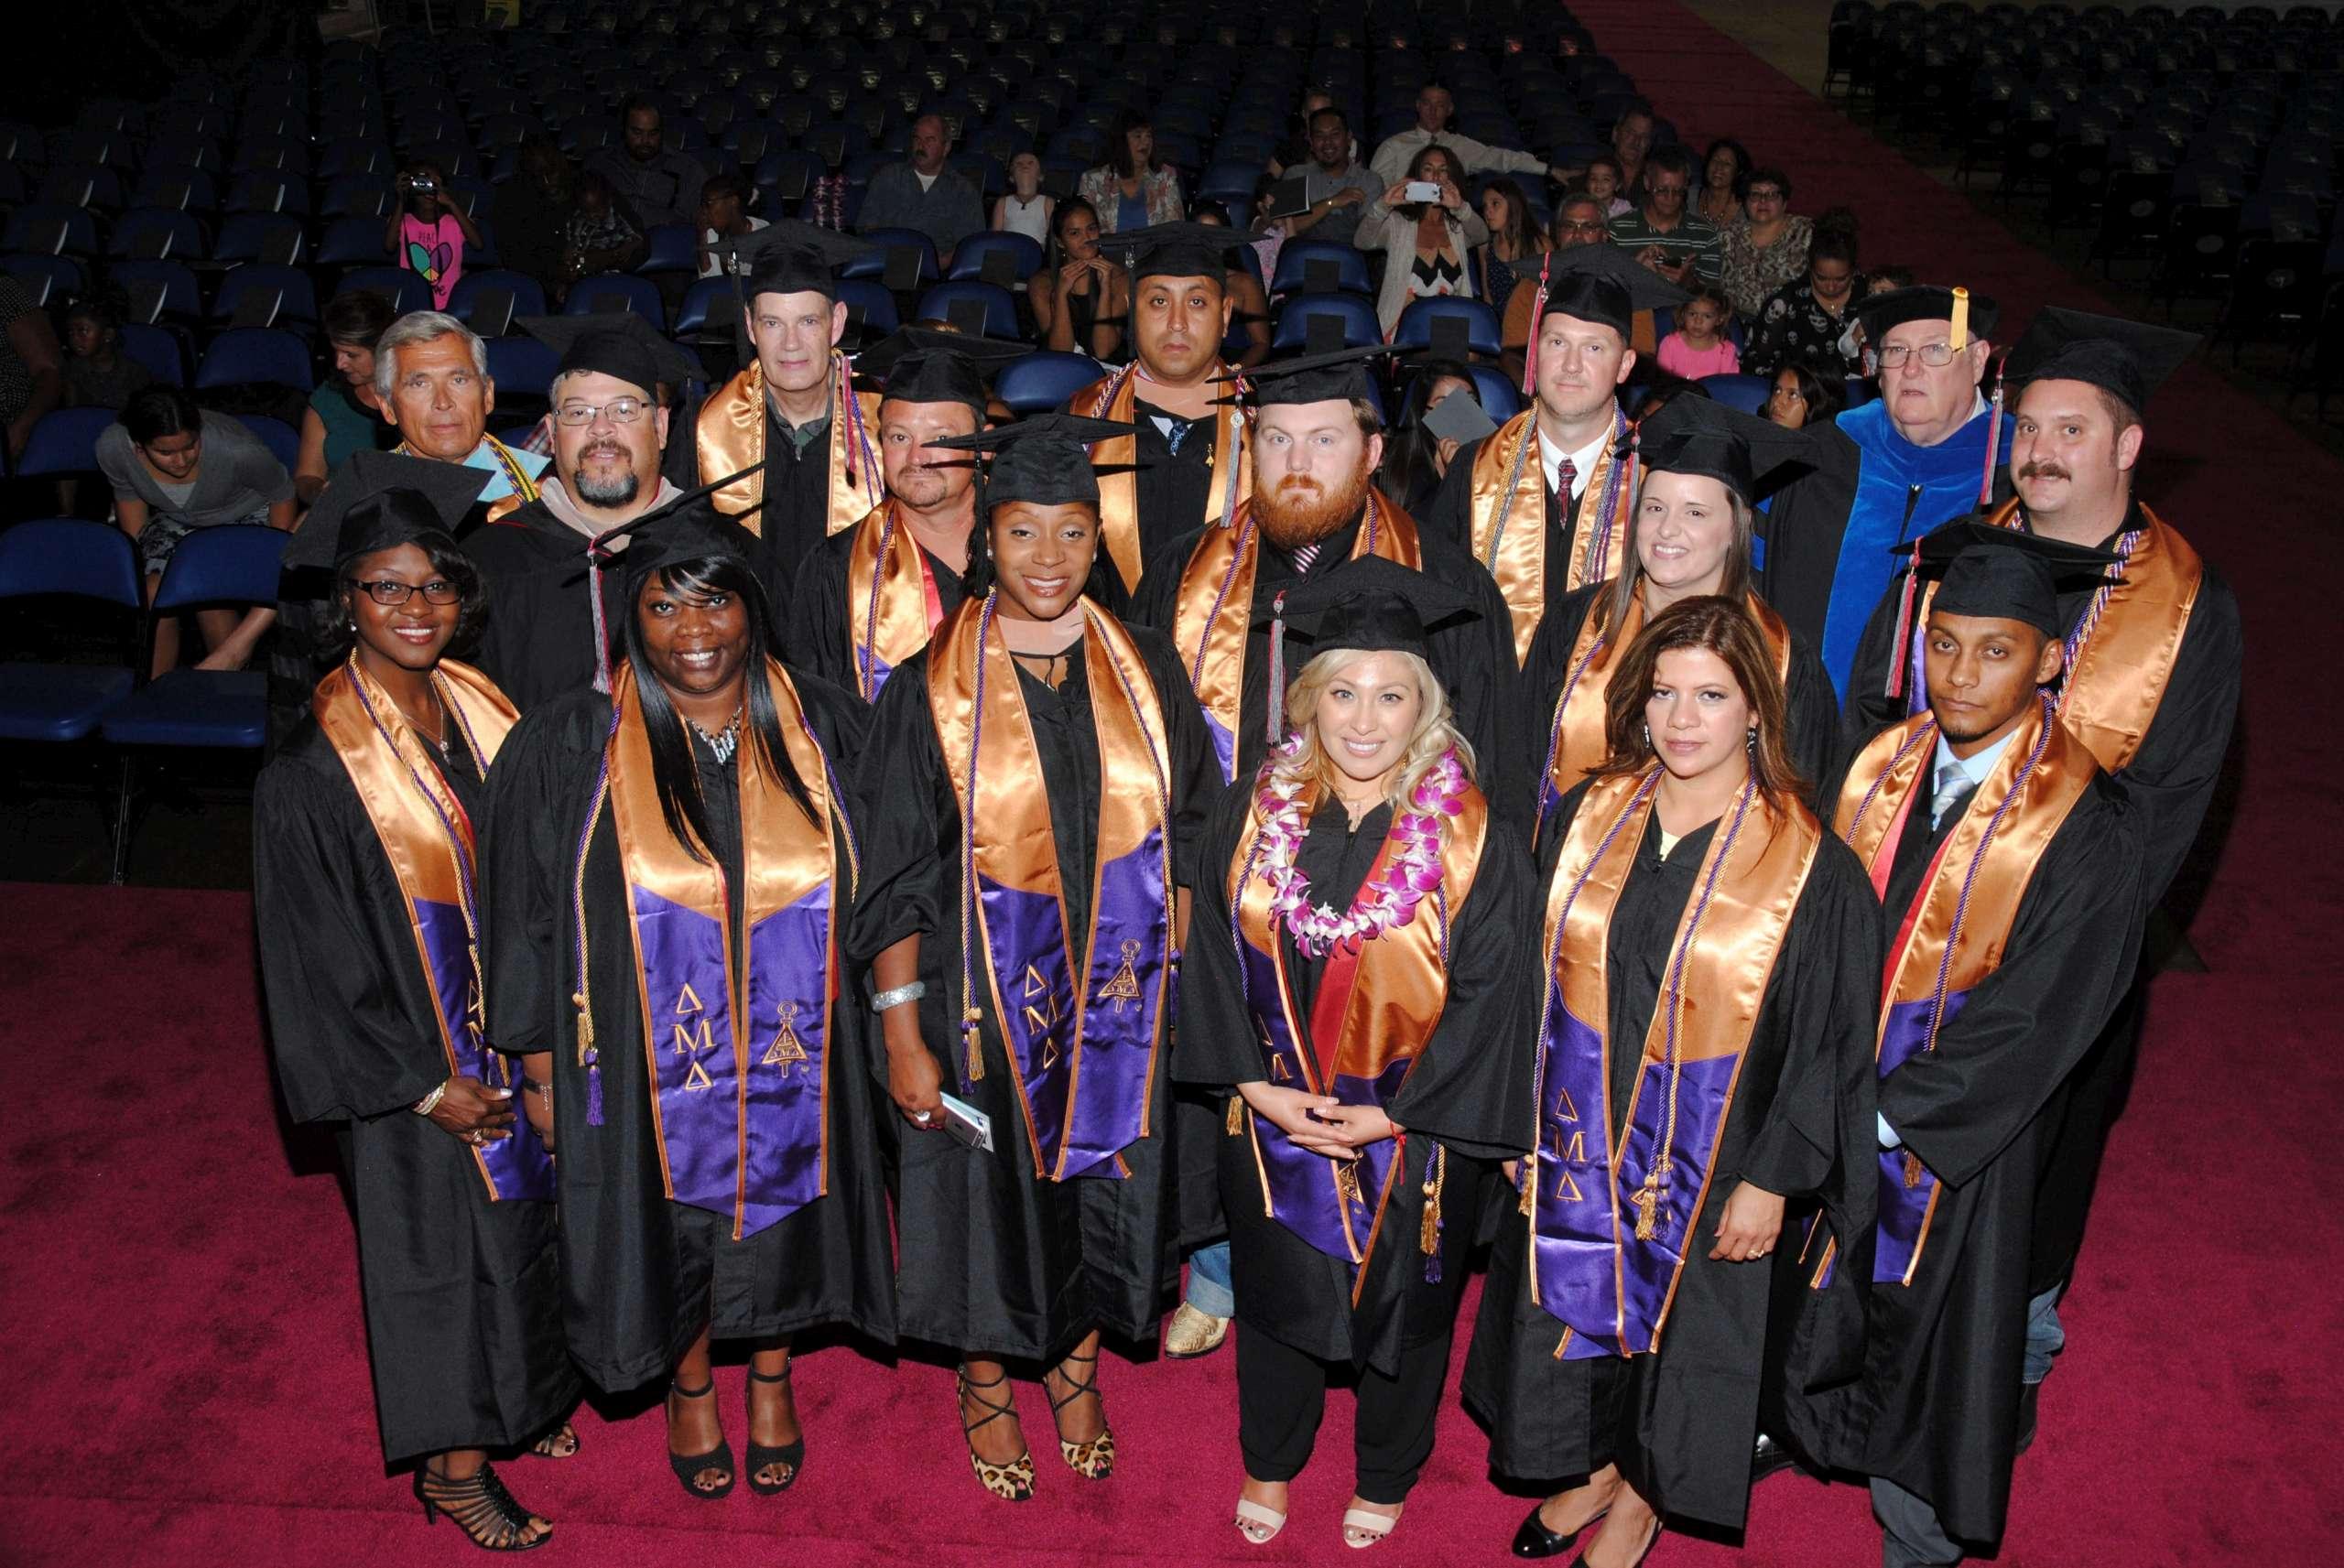 University Of Phoenix Doctoral Graduation Regalia - Online Colleges All